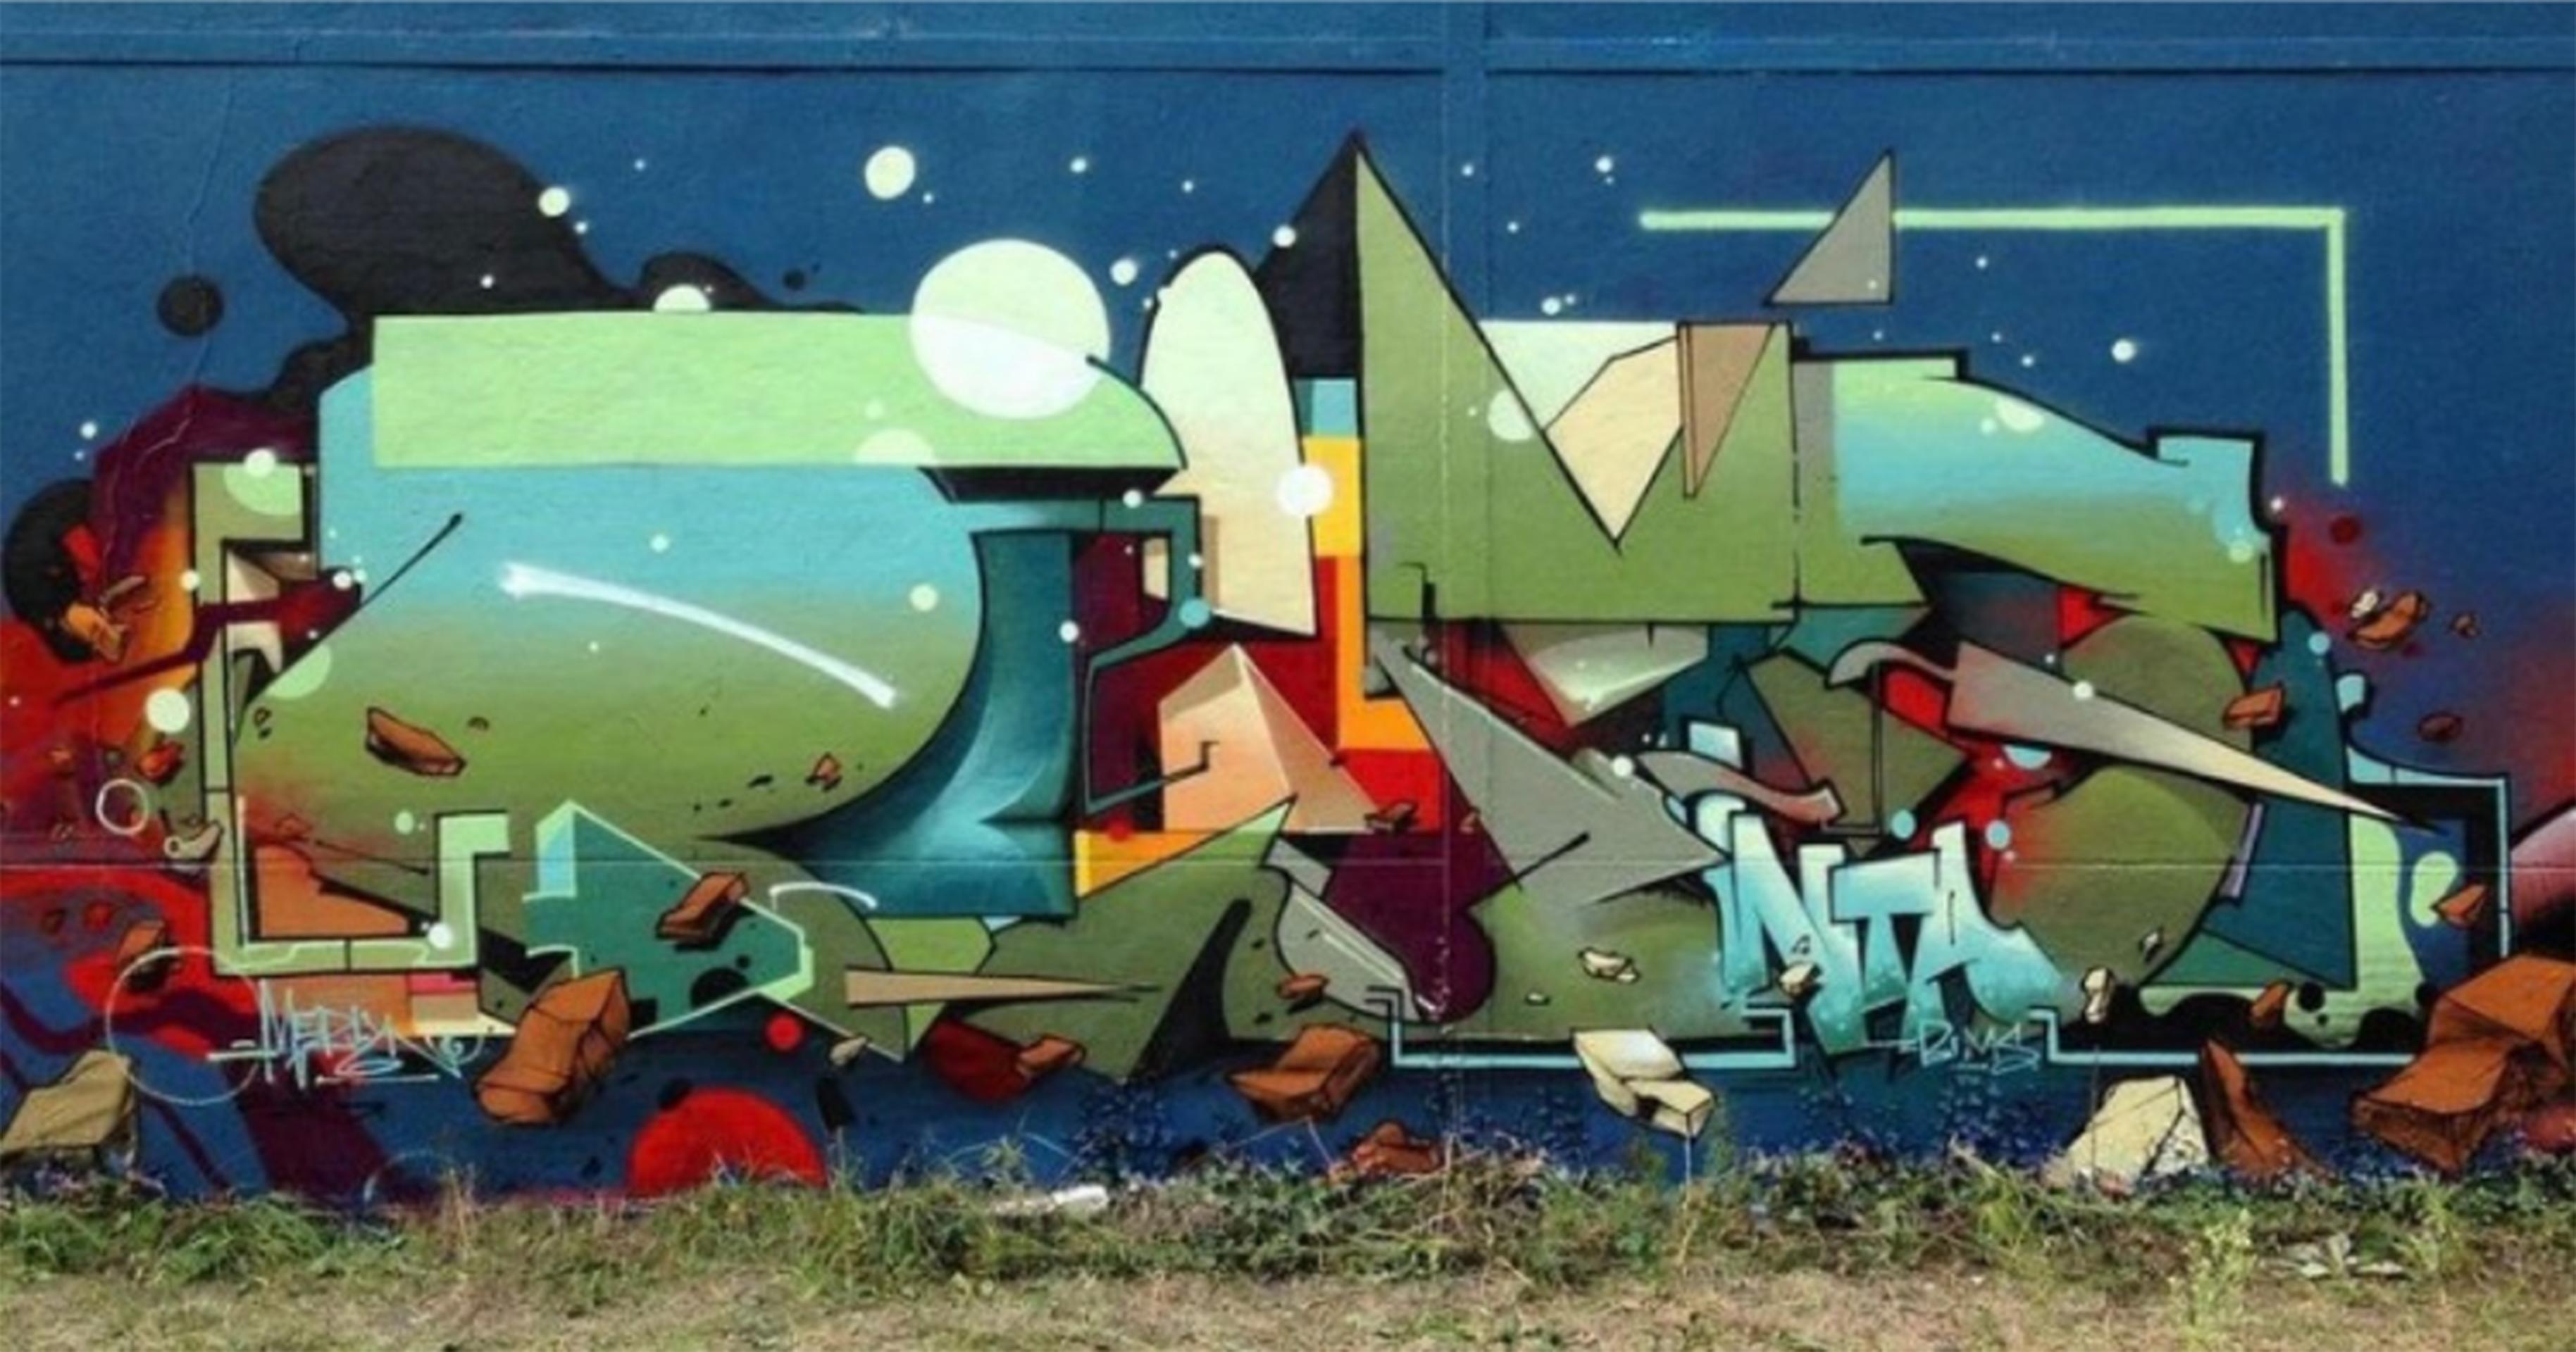 Le Mur Nantes / Soirée d'inauguration / Mix Two – DJ CLB & Puppa Dready